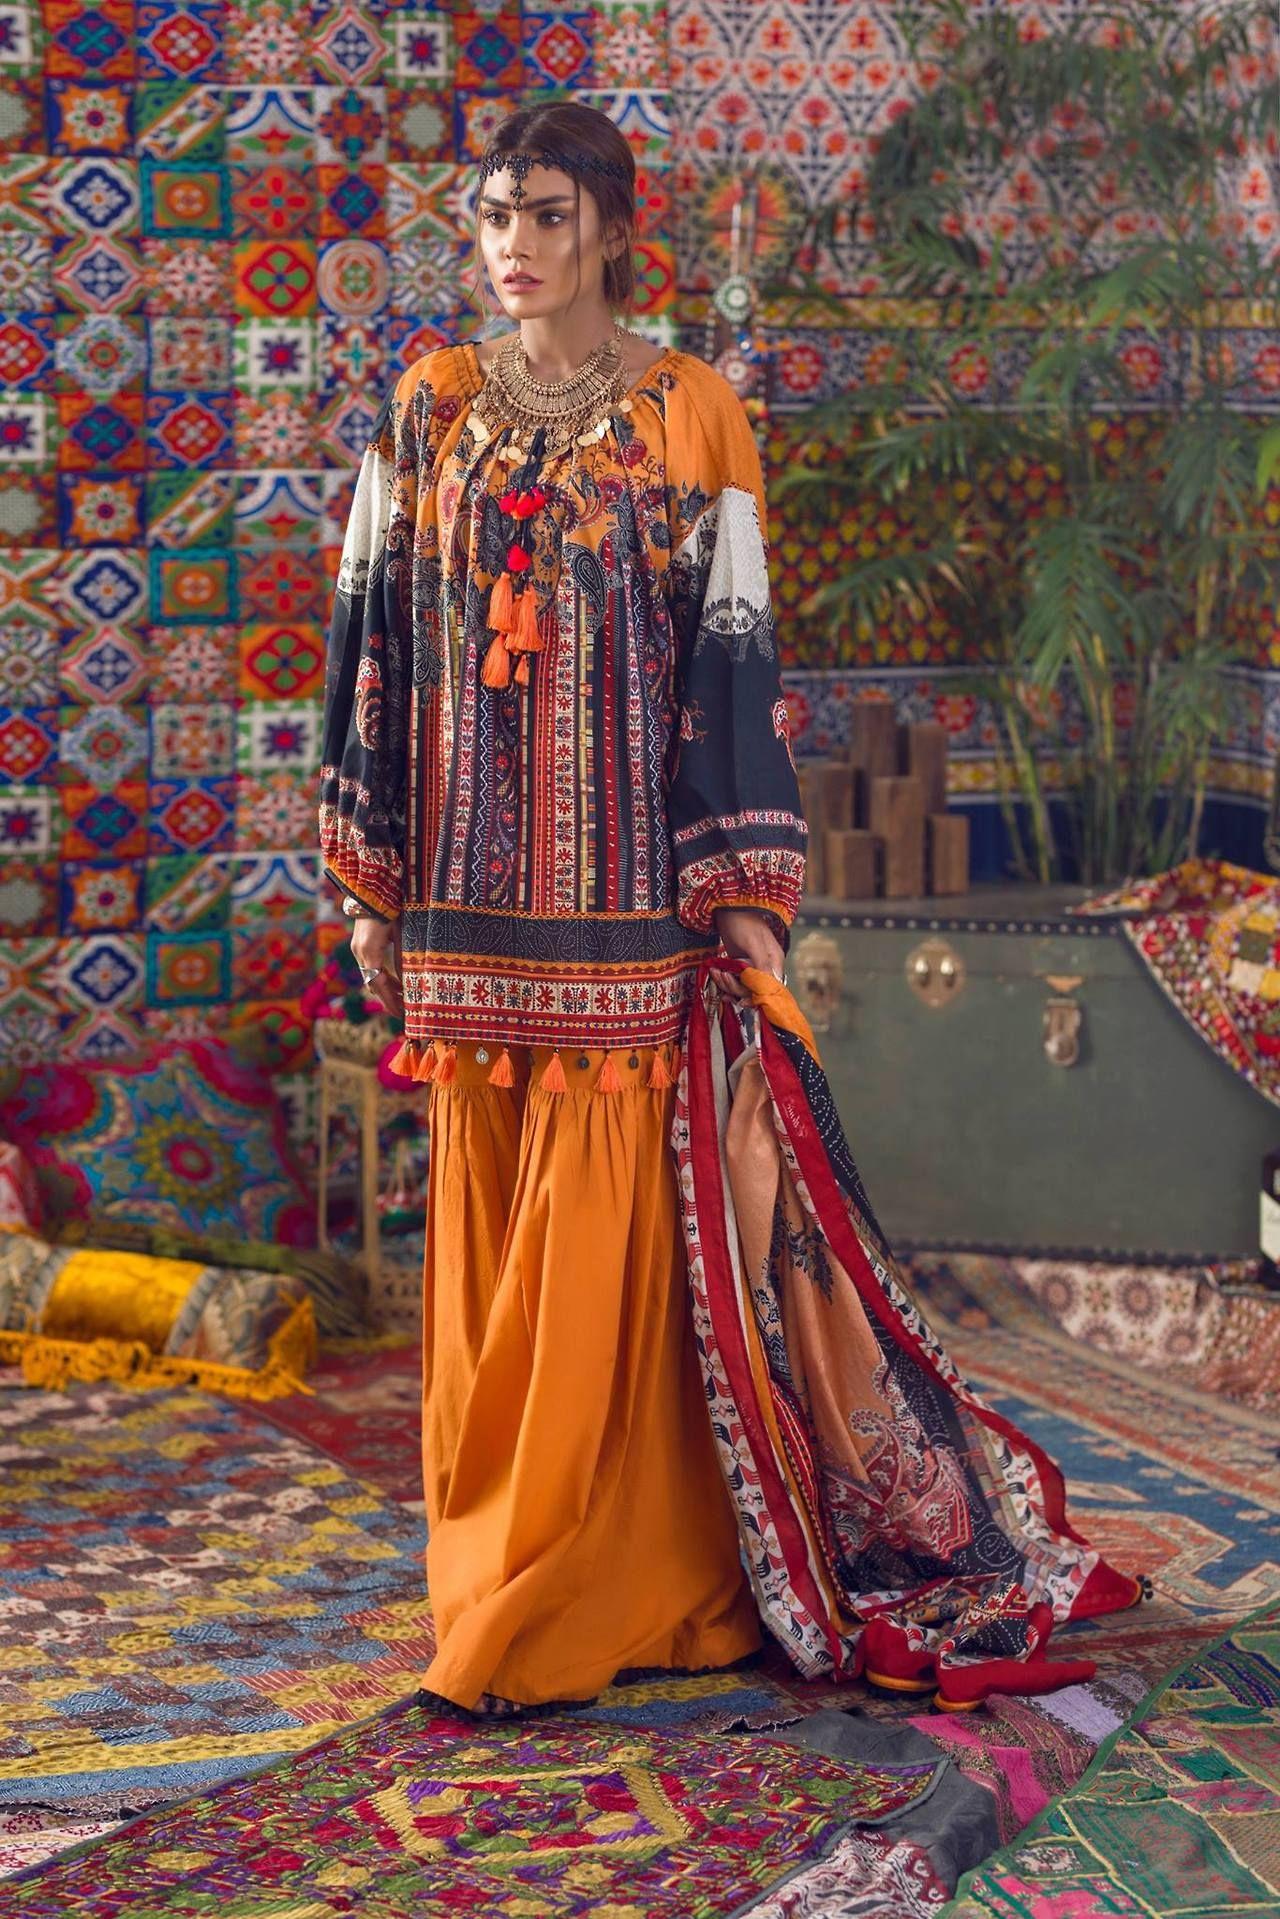 Fashion Pakistan Ethnic By Outfitters Kinship 2017 Via Tumblr Pakistanifashionedits